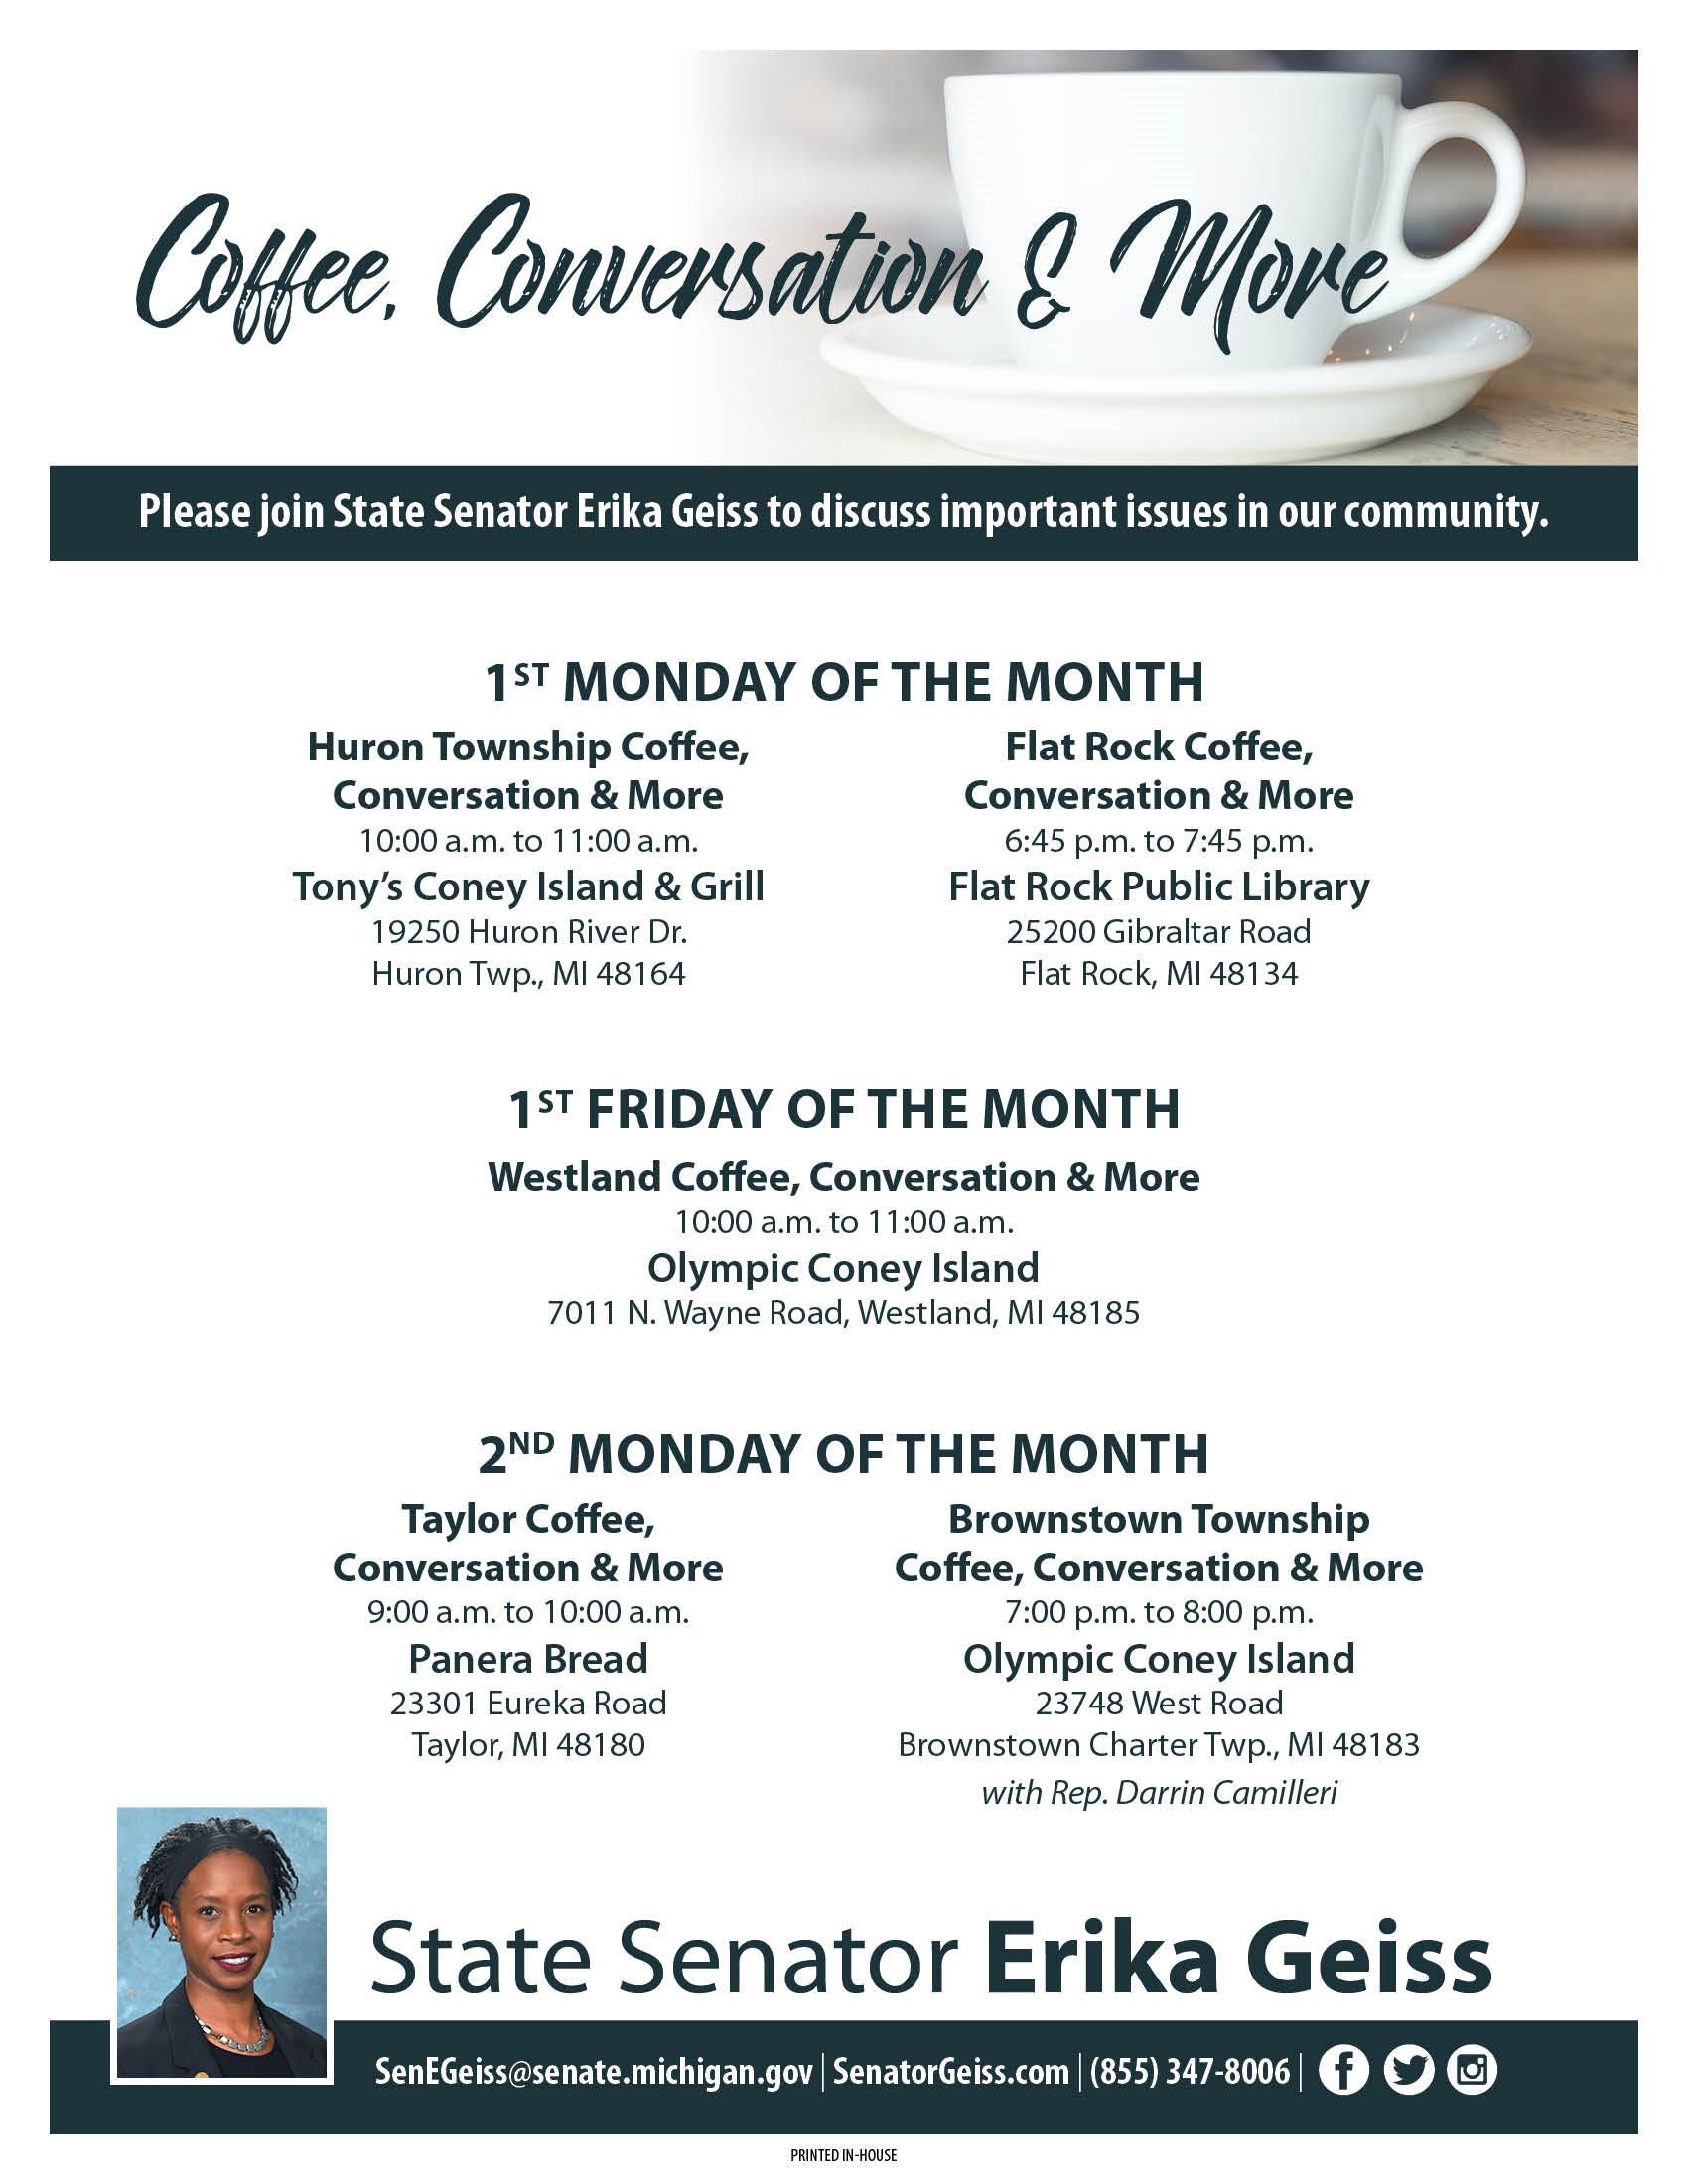 Coffee, Conversation & More District Flyer.jpg